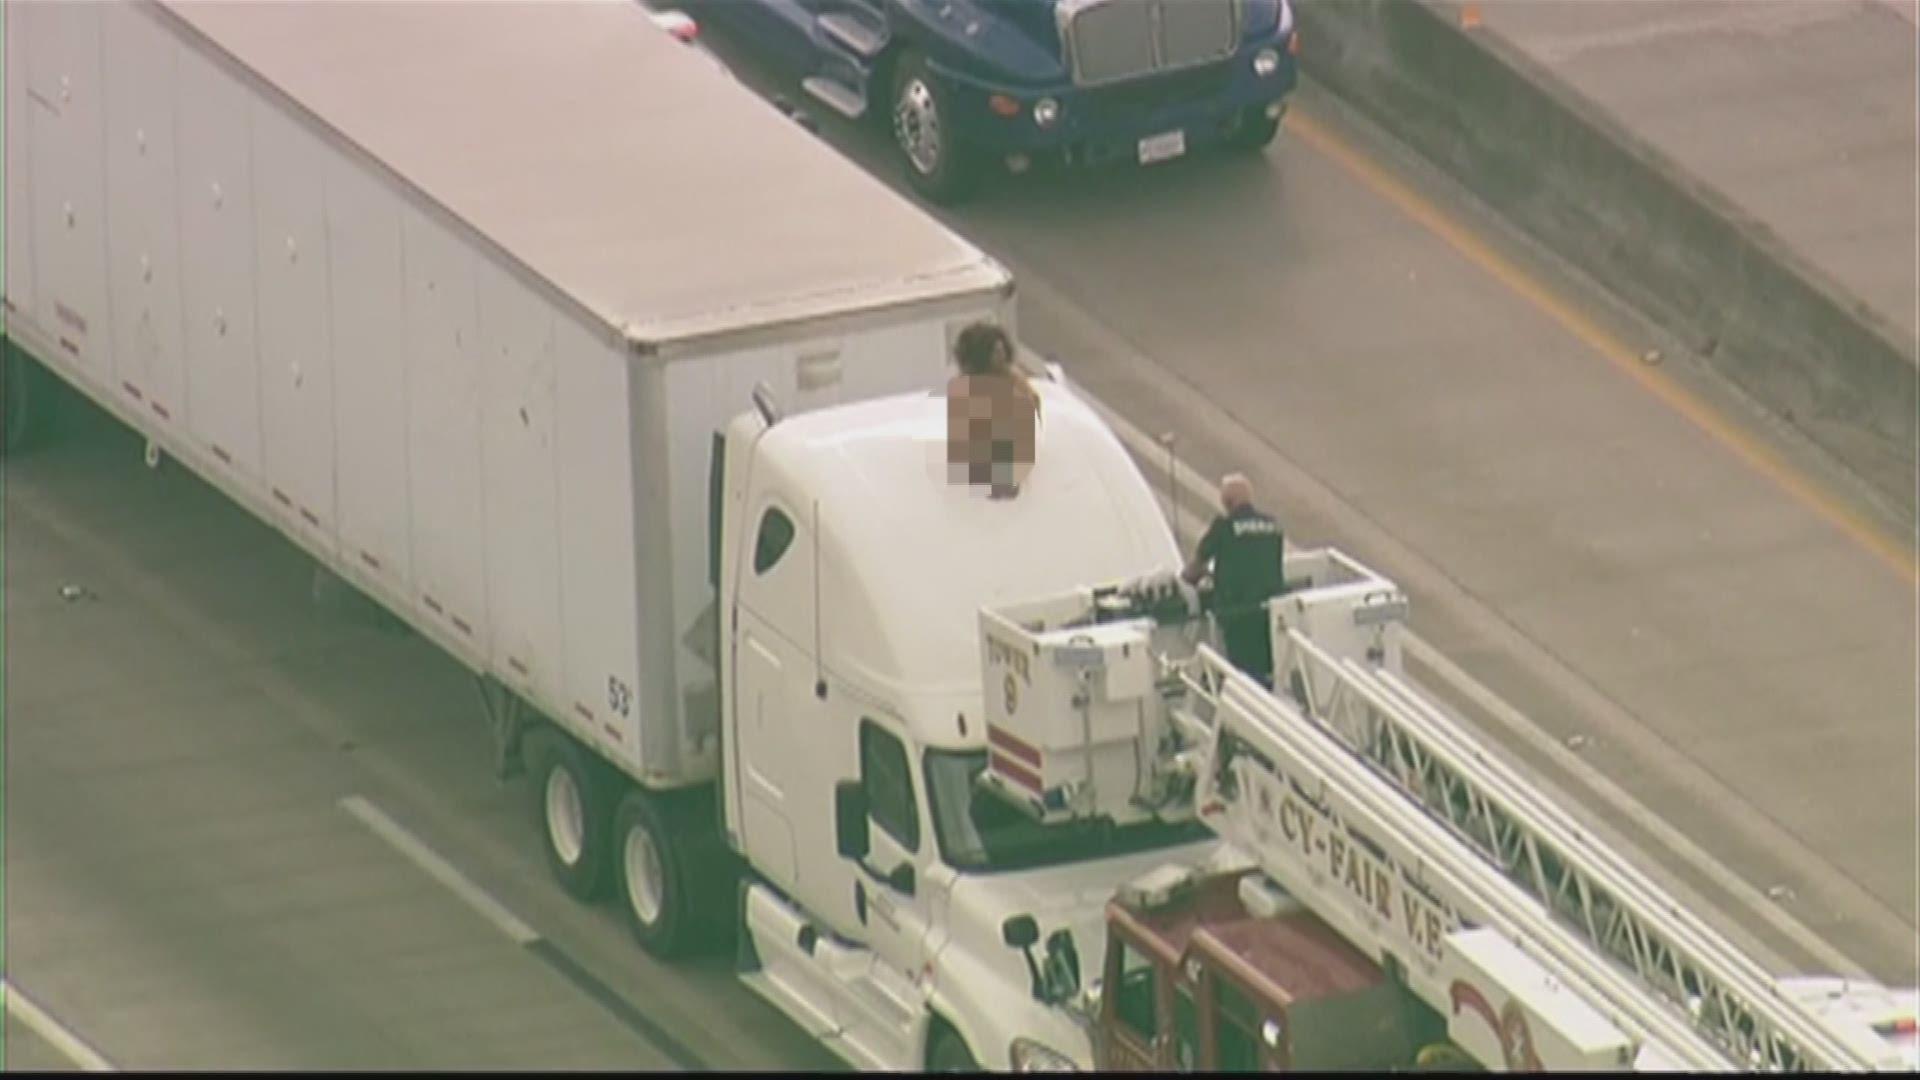 Naked, Dancing Woman Shuts Down Houston Highway - NewsOn6